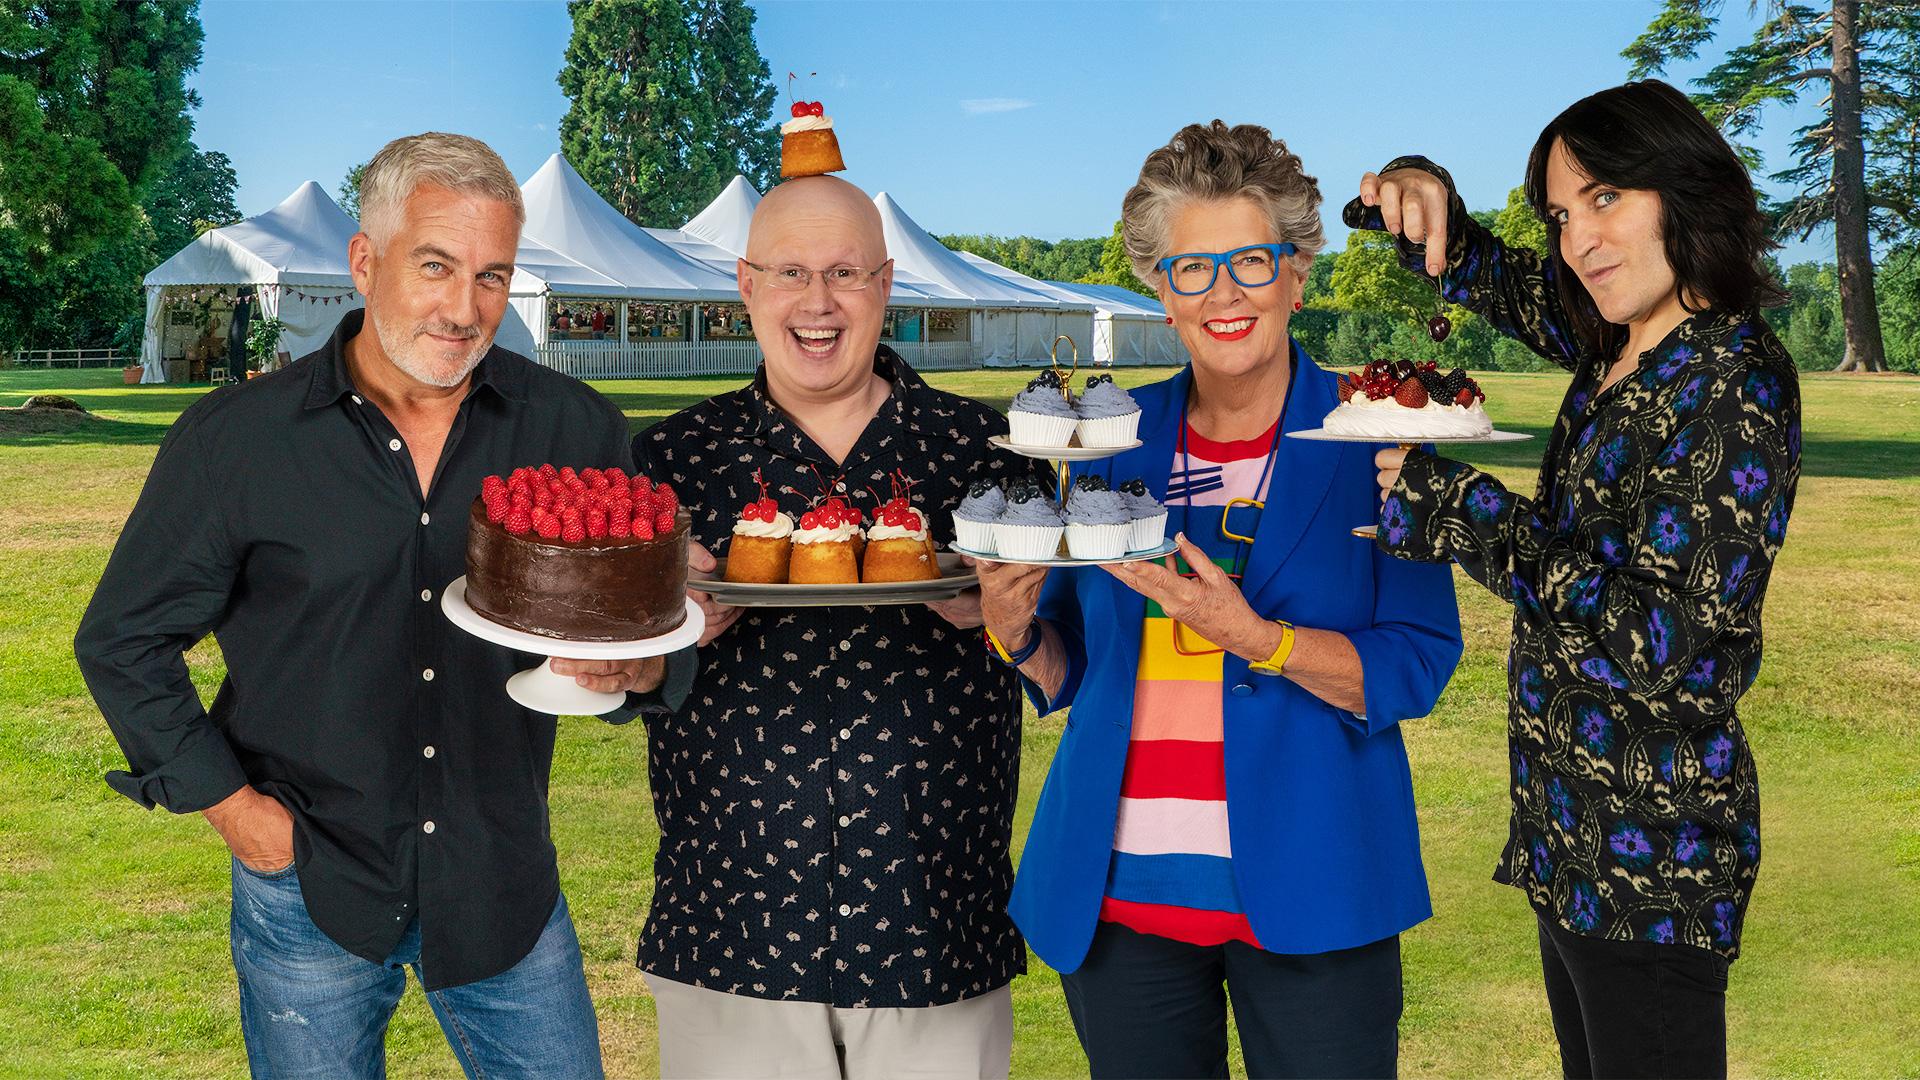 bake off (Credit: Channel 4)